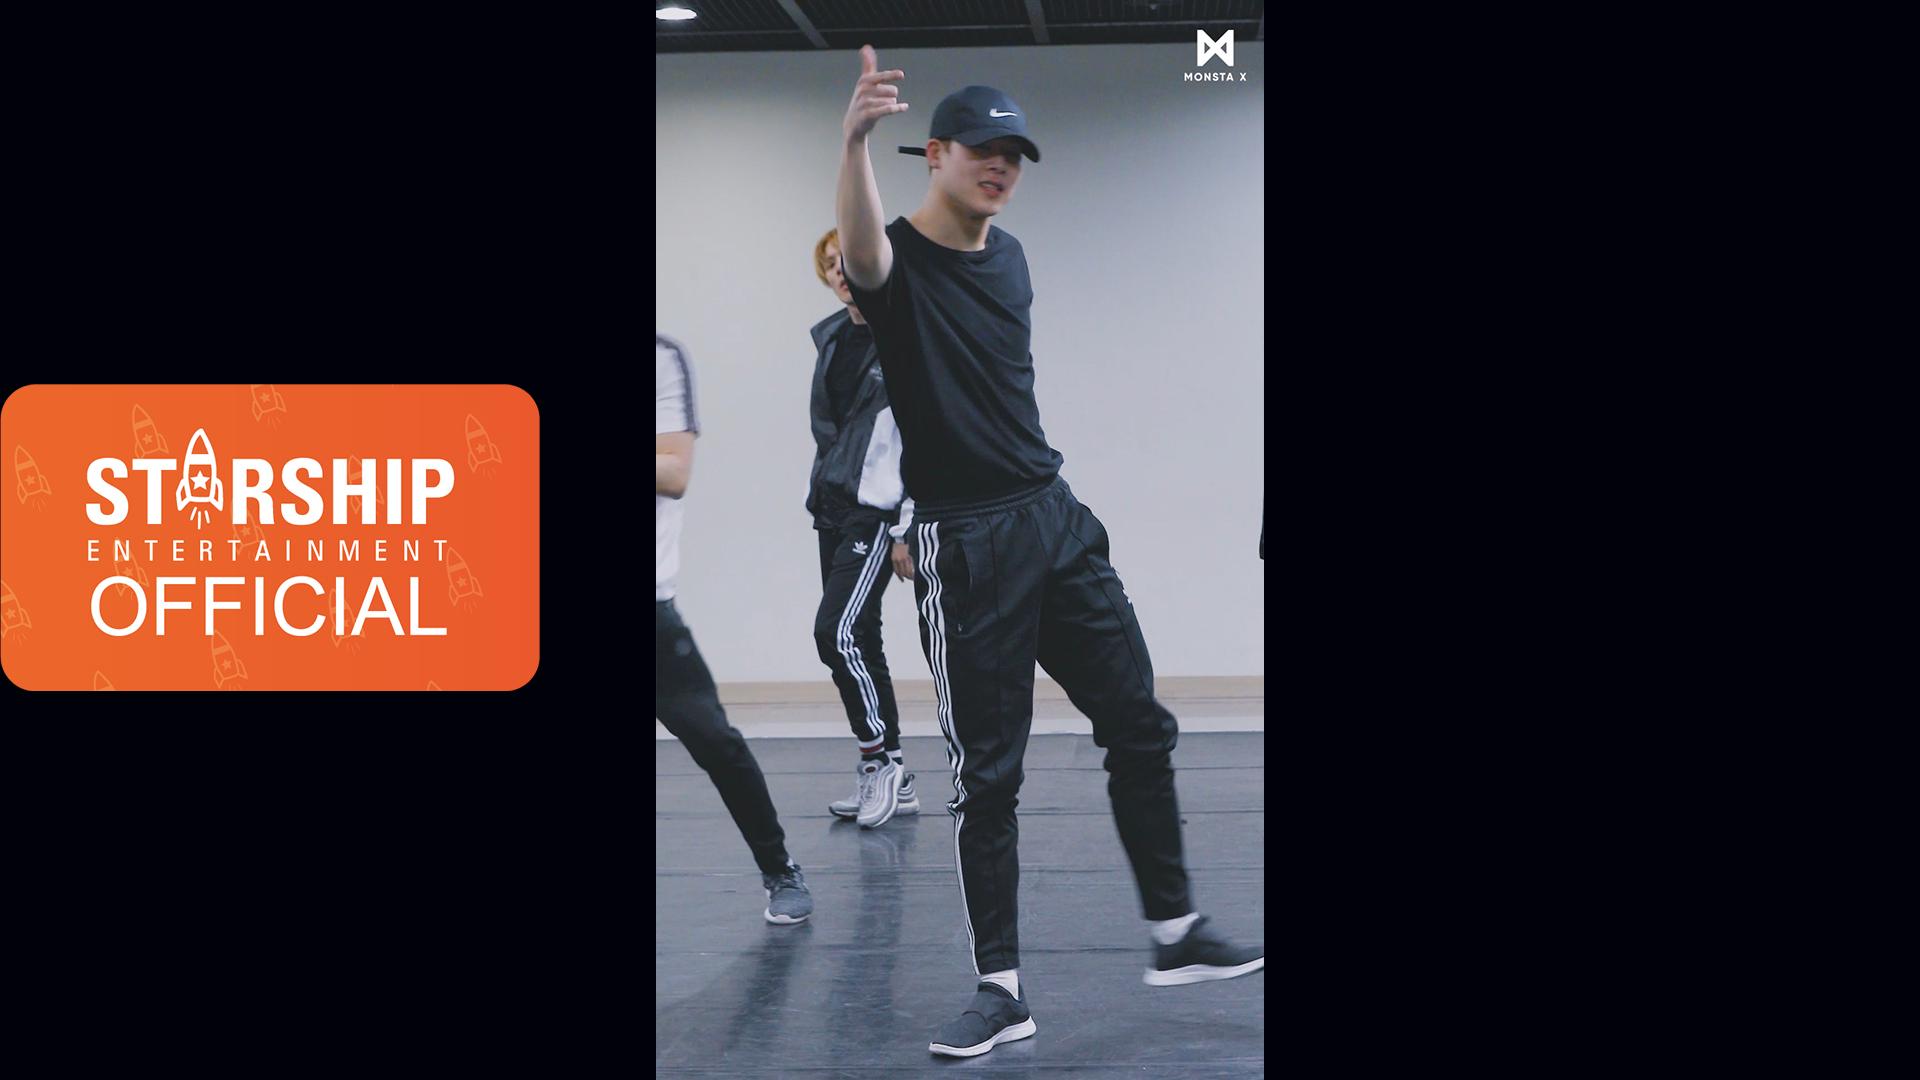 [JOOHEON][Dance Practice] 몬스타엑스 (MONSTA X) - 'JEALOUSY' Vertical Video